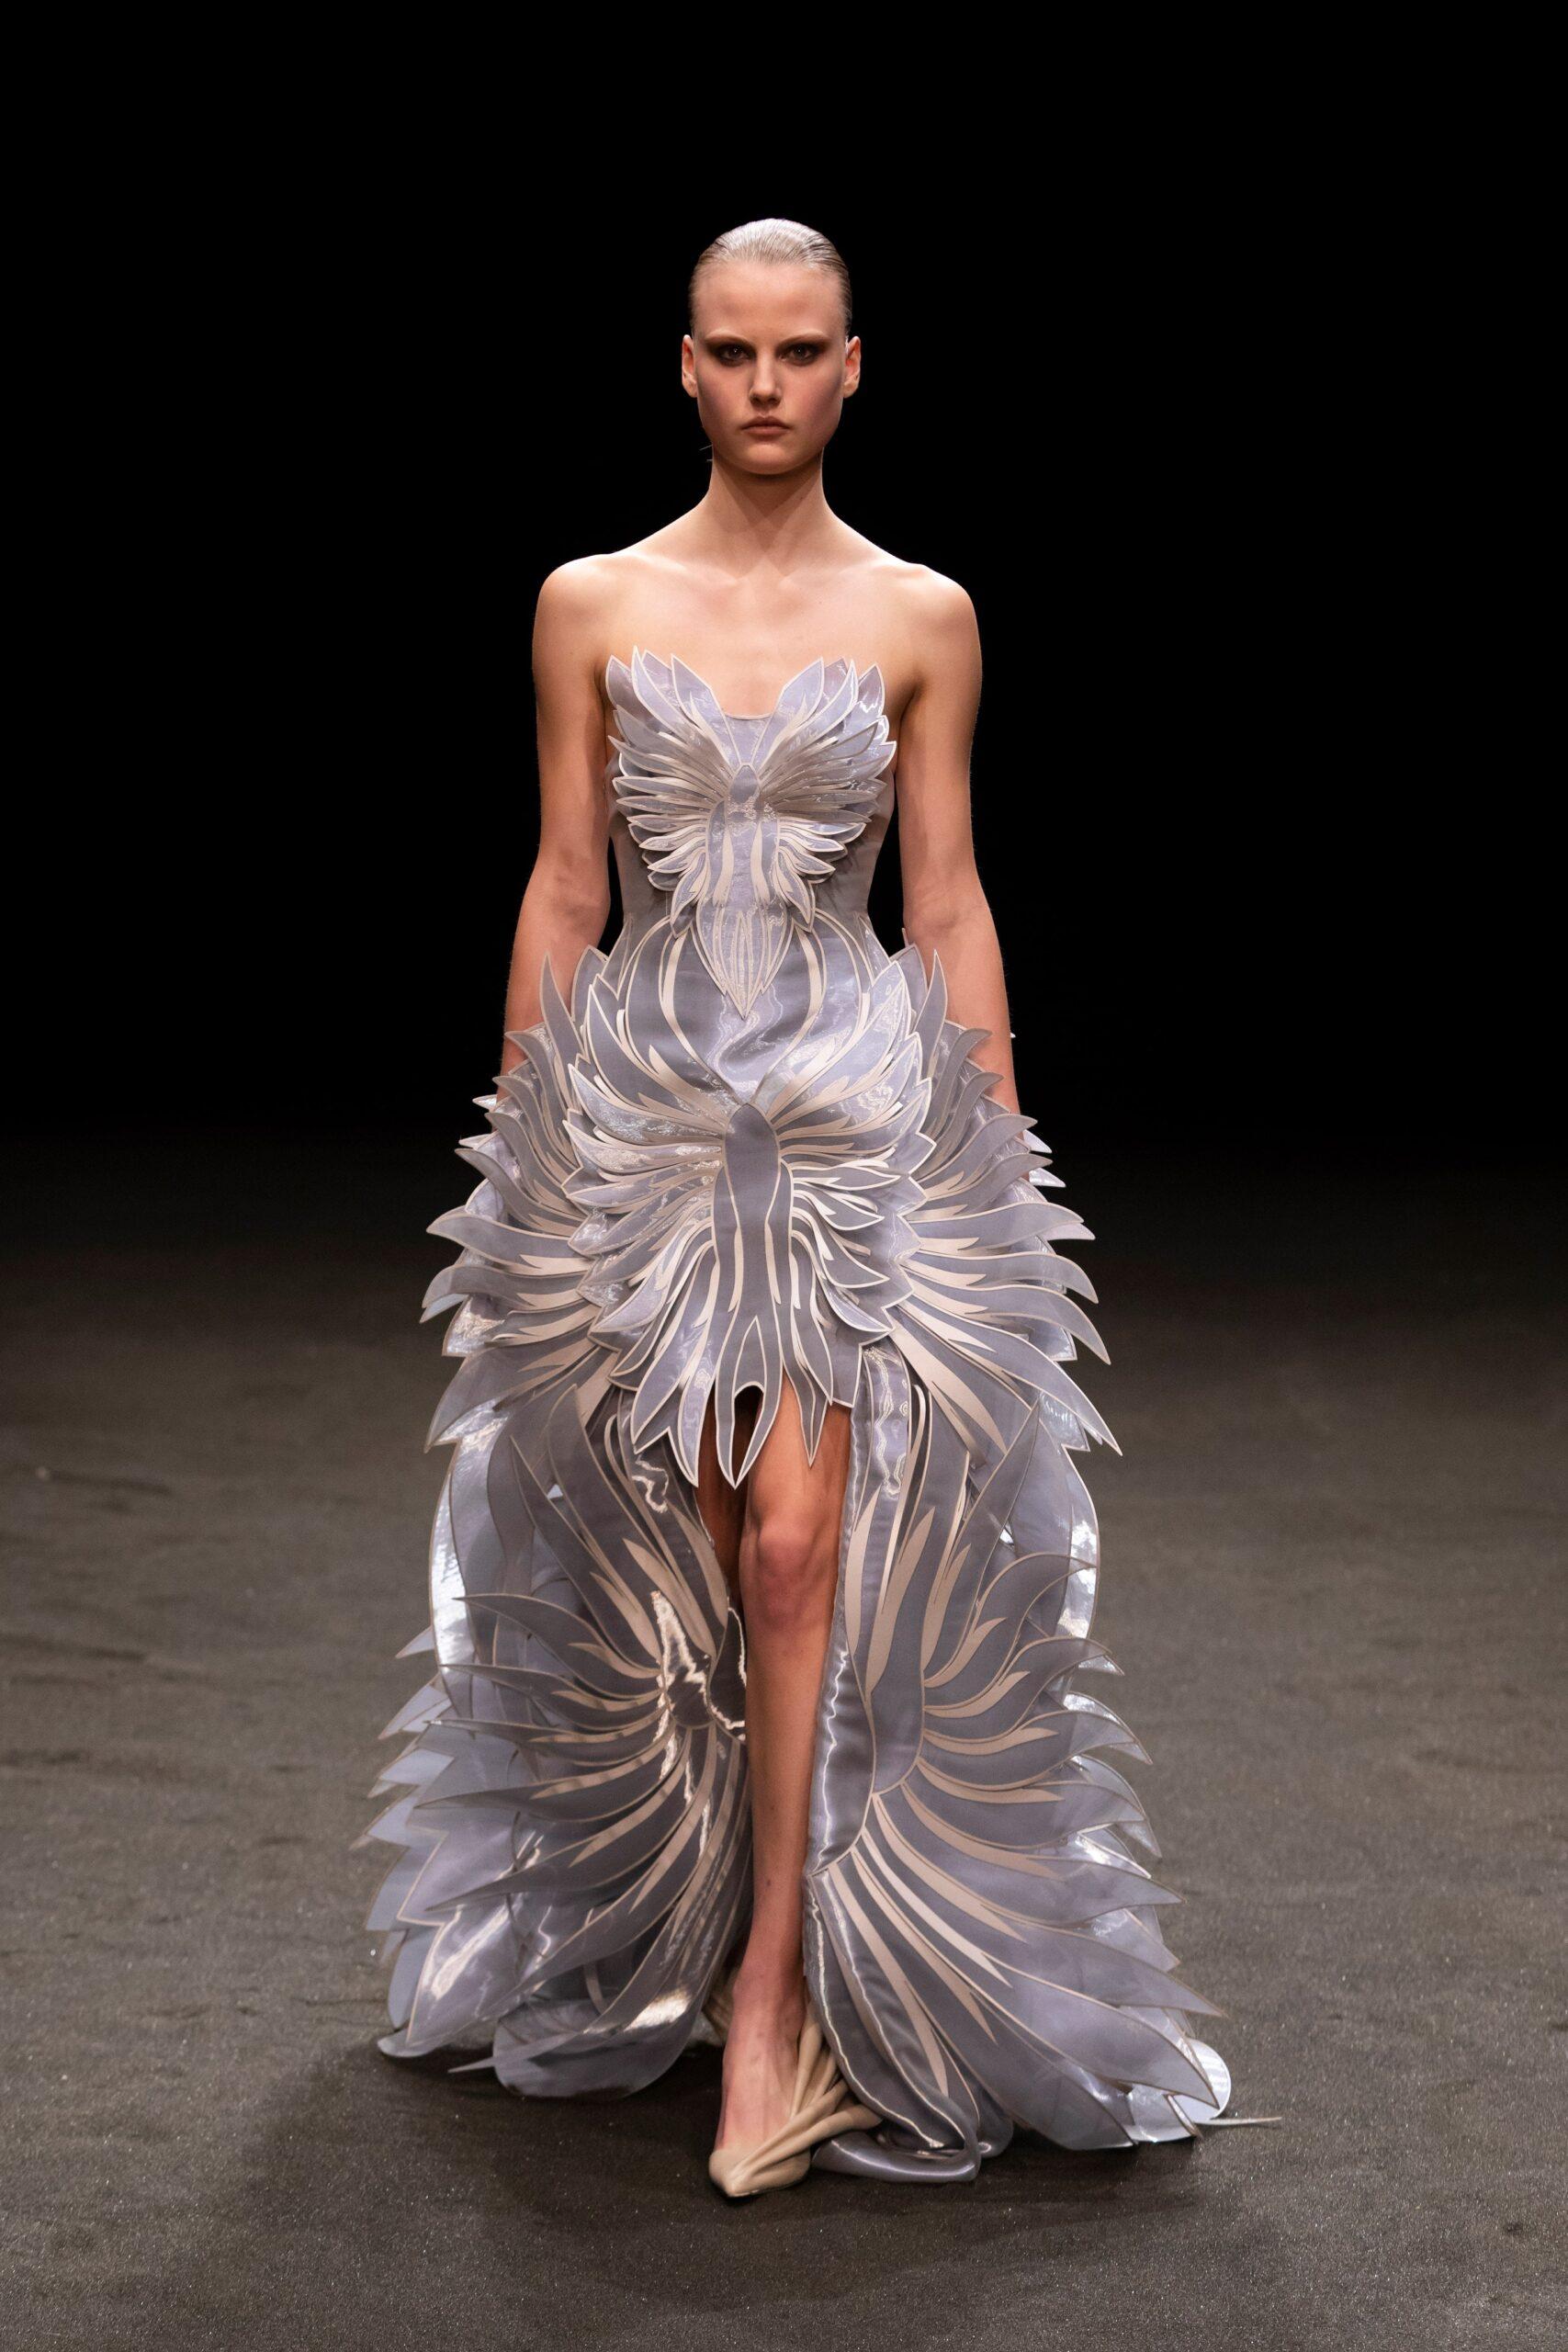 00019 Iris van Herpen Couture Spring 21 credit Gio Staiano